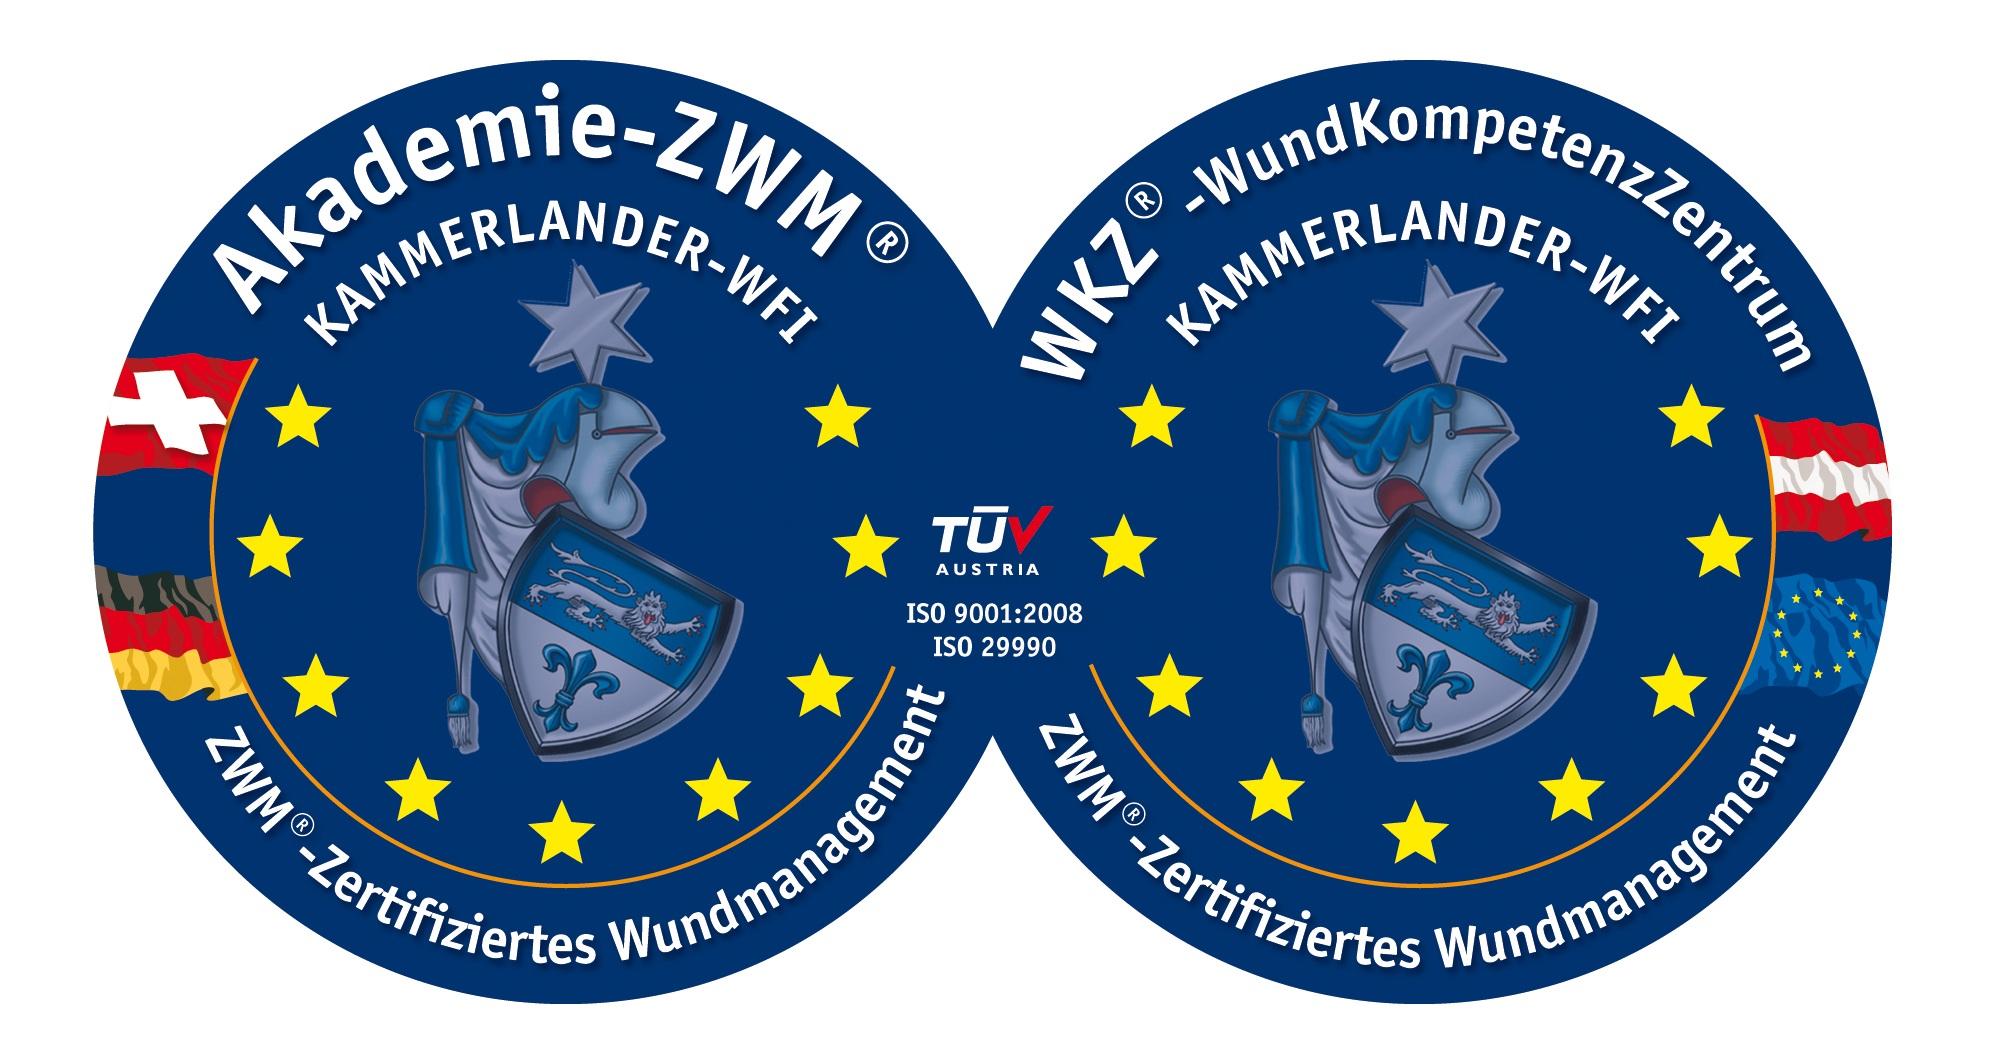 Akademie-ZWM® Kammerlander-WFI